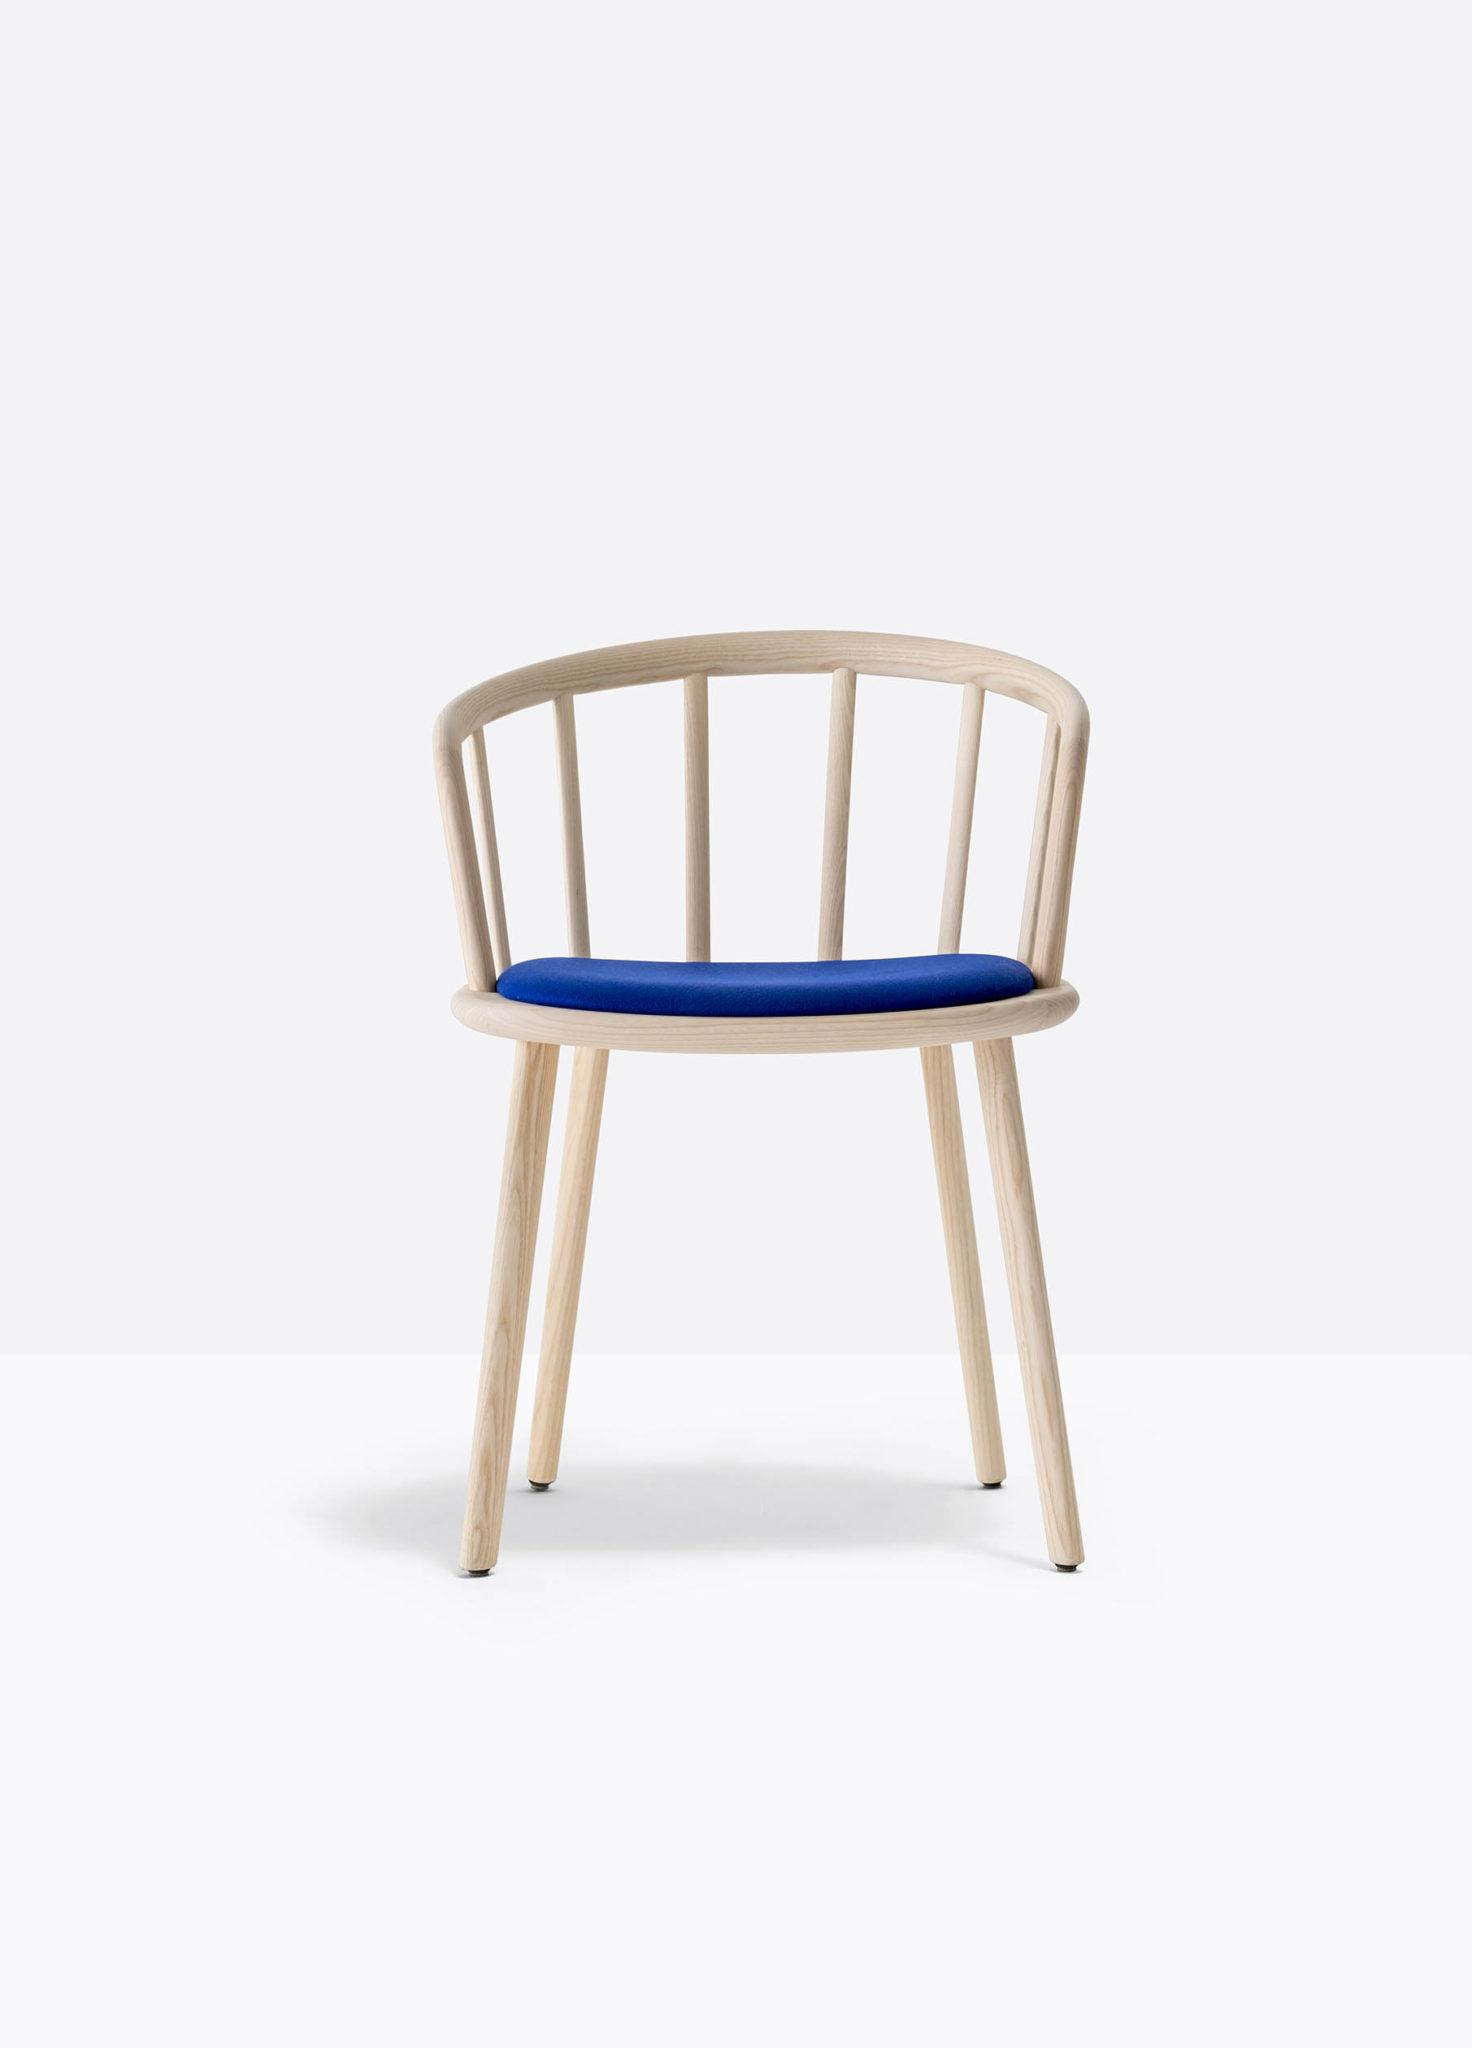 PEDRALI NYM 2836 fauteuil bois placet assise tissu